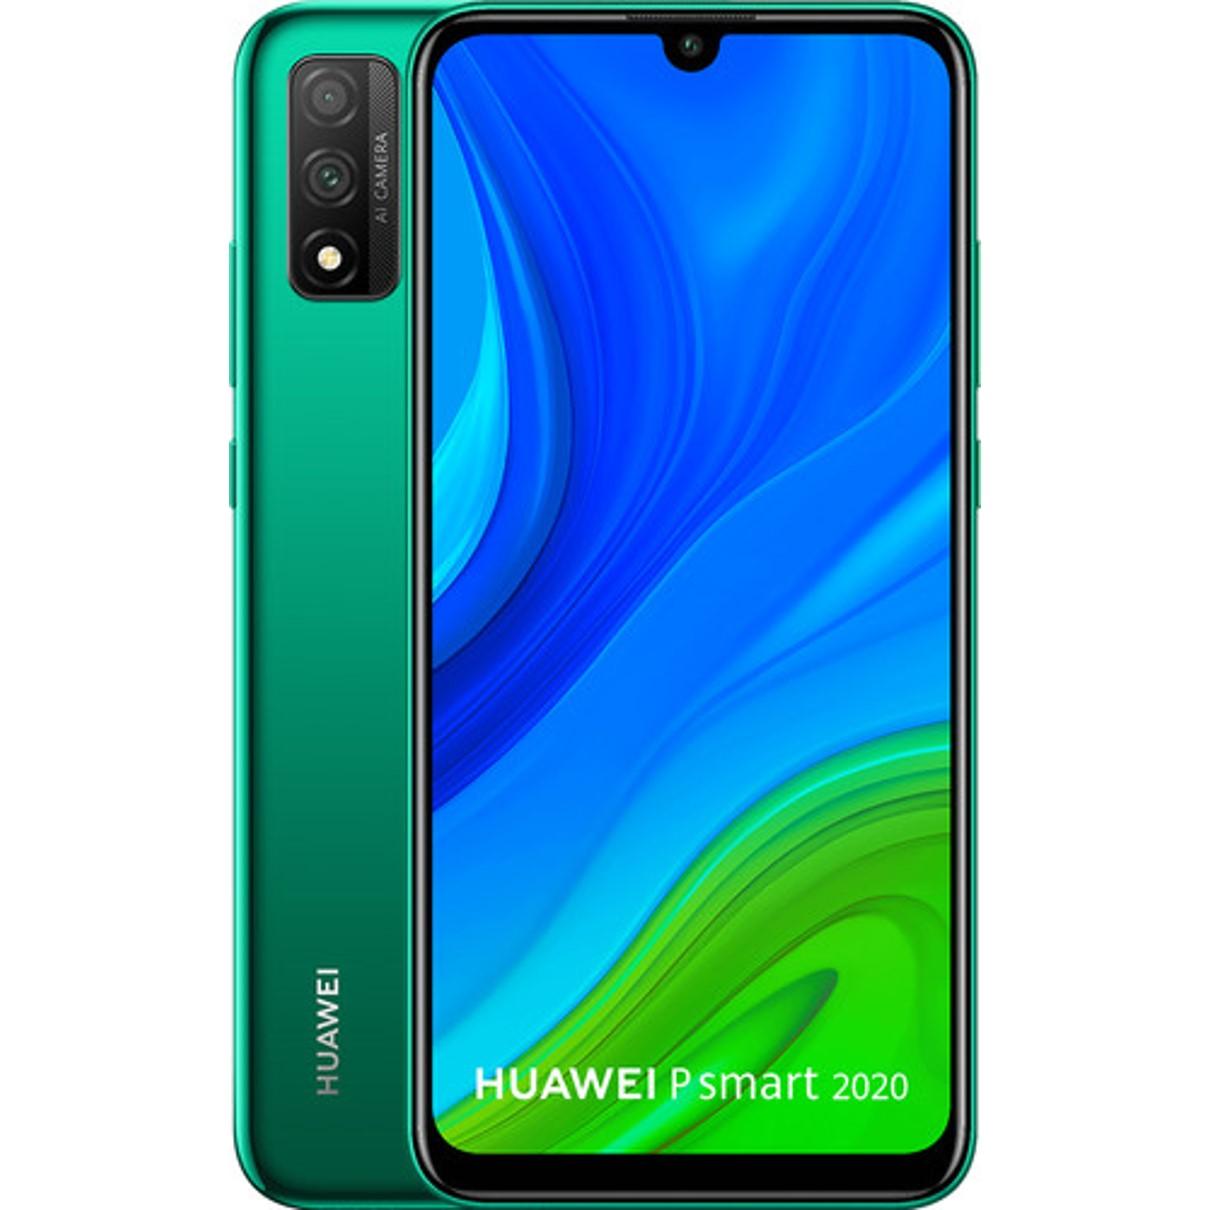 "TELEFONO MOVIL SMARTPHONE HUAWEI P SMART 2020 EMERALD GREEN/ 6.21""/ 128GB ROM/ 4GB RAM/ 13+2MPX - 8MPX/ OCTA CORE/ 3400 MAH/ HUELLA"